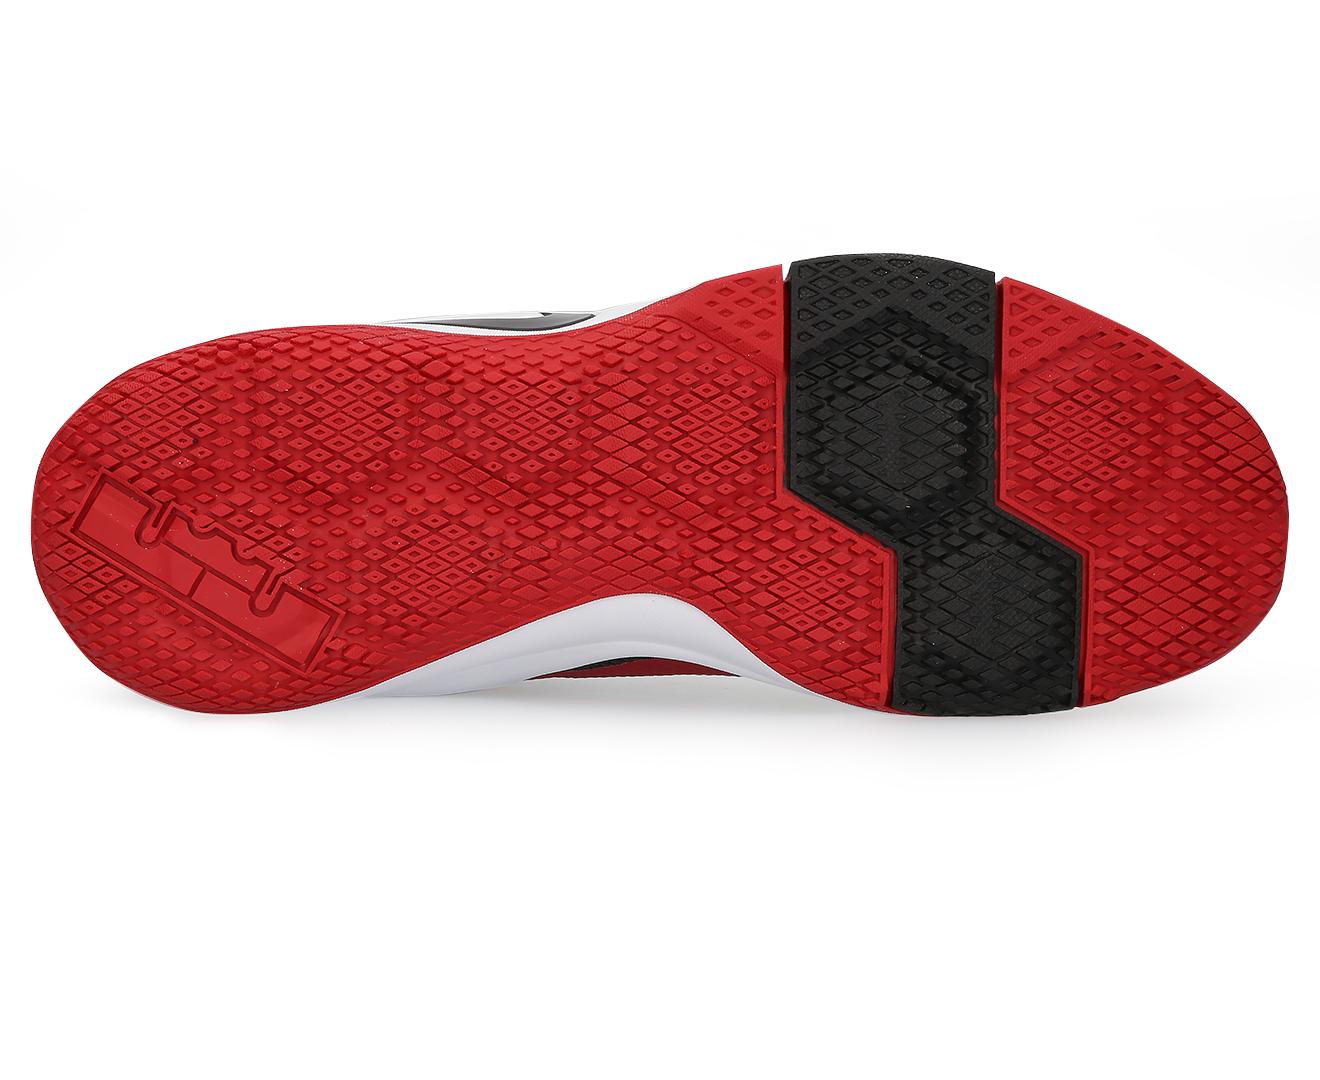 a8e73278 Nike Men's Lebron Witness II Shoe - Black/White/Gym Red | Catch.com.au